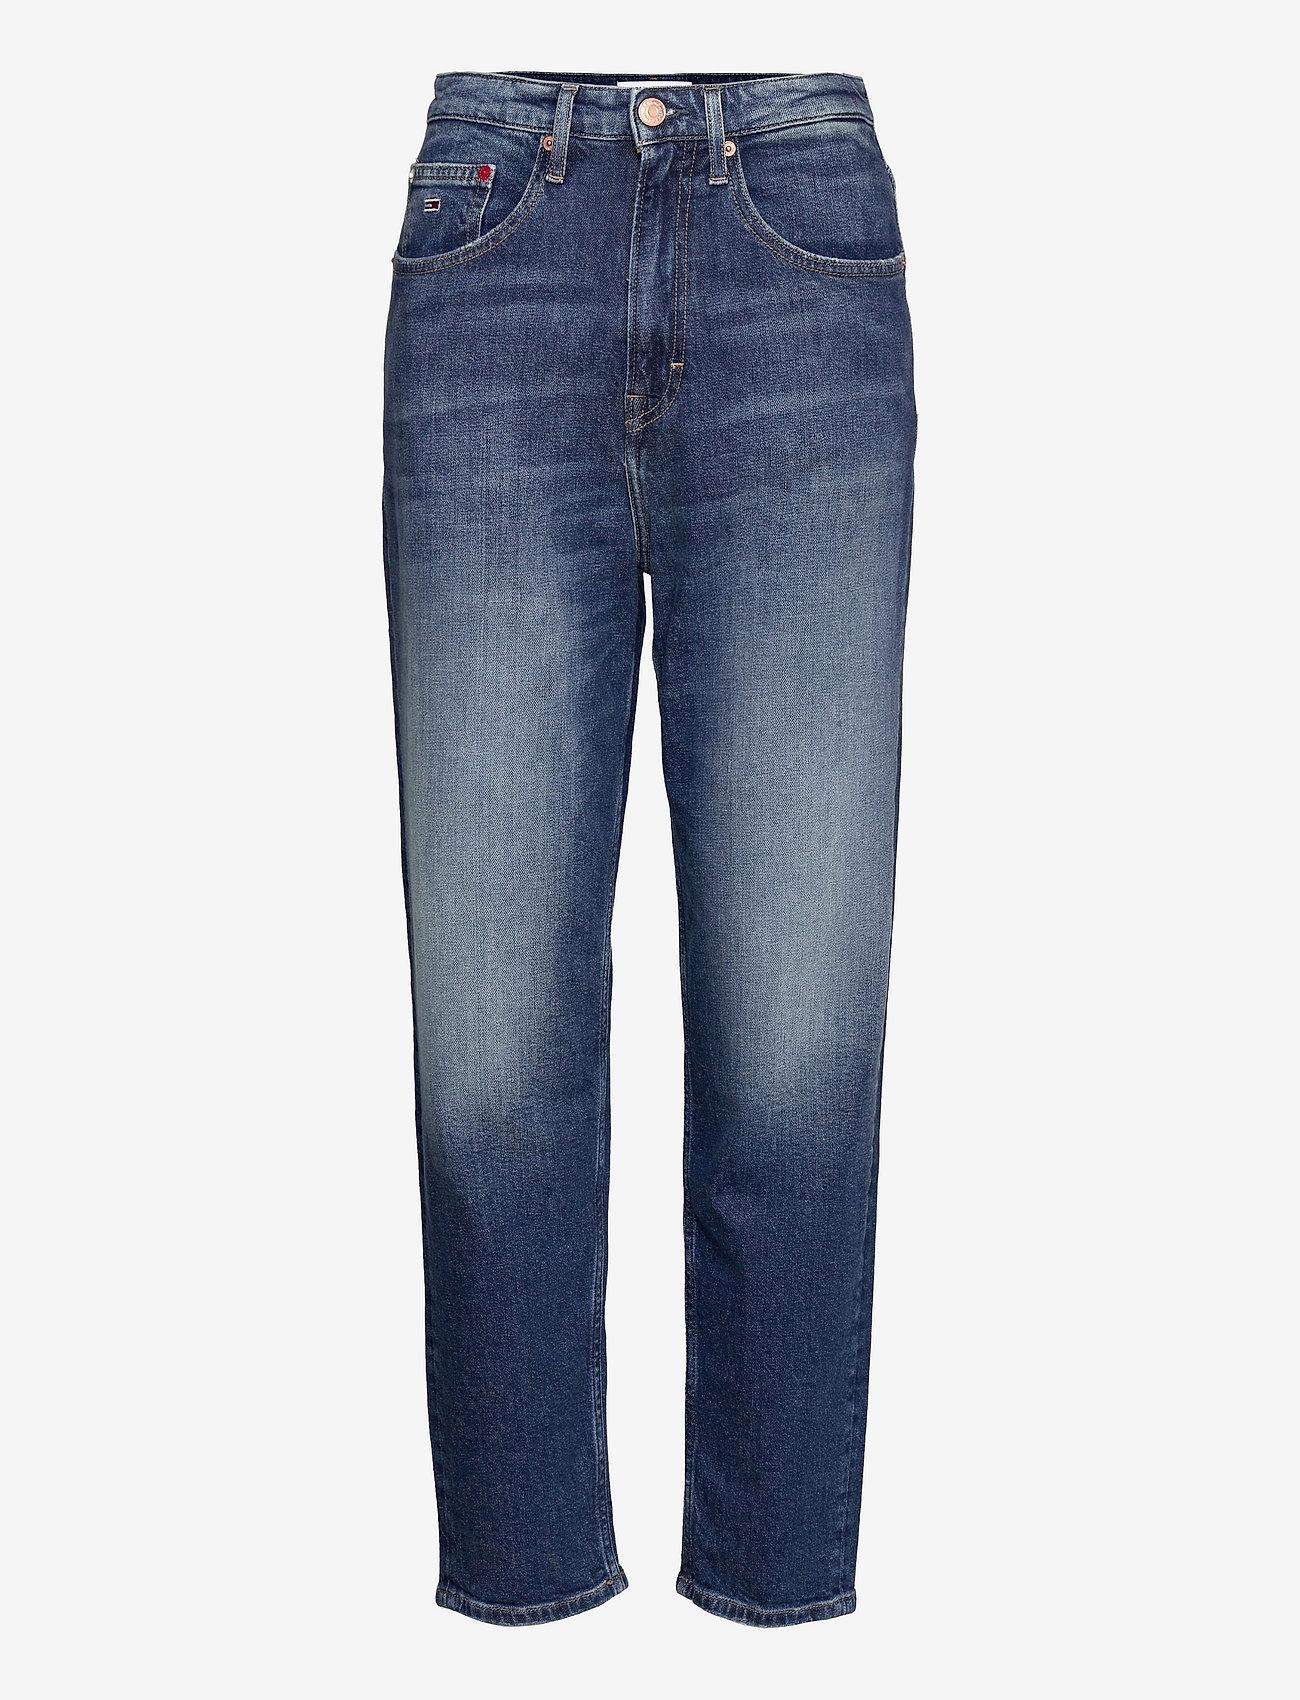 Tommy Jeans - MOM JEAN UHR TPRD AE632 MBC - tapered jeans - denim medium - 0